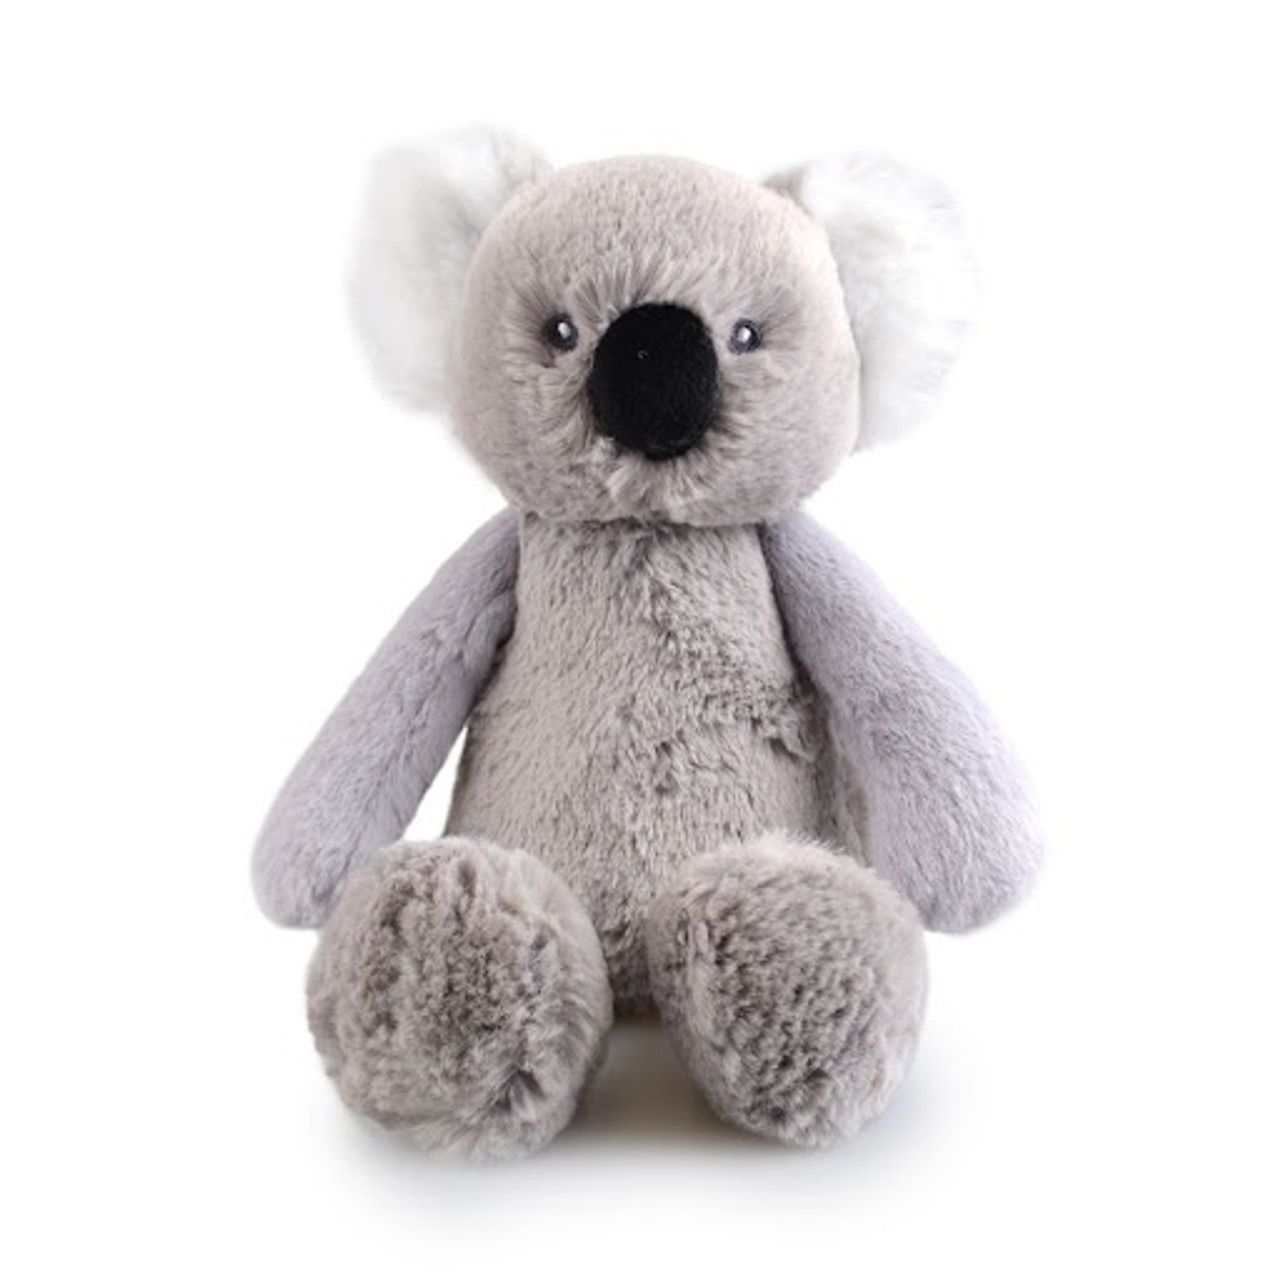 Korimco Frankie and Friends Plush Toy 28 cm - Koala